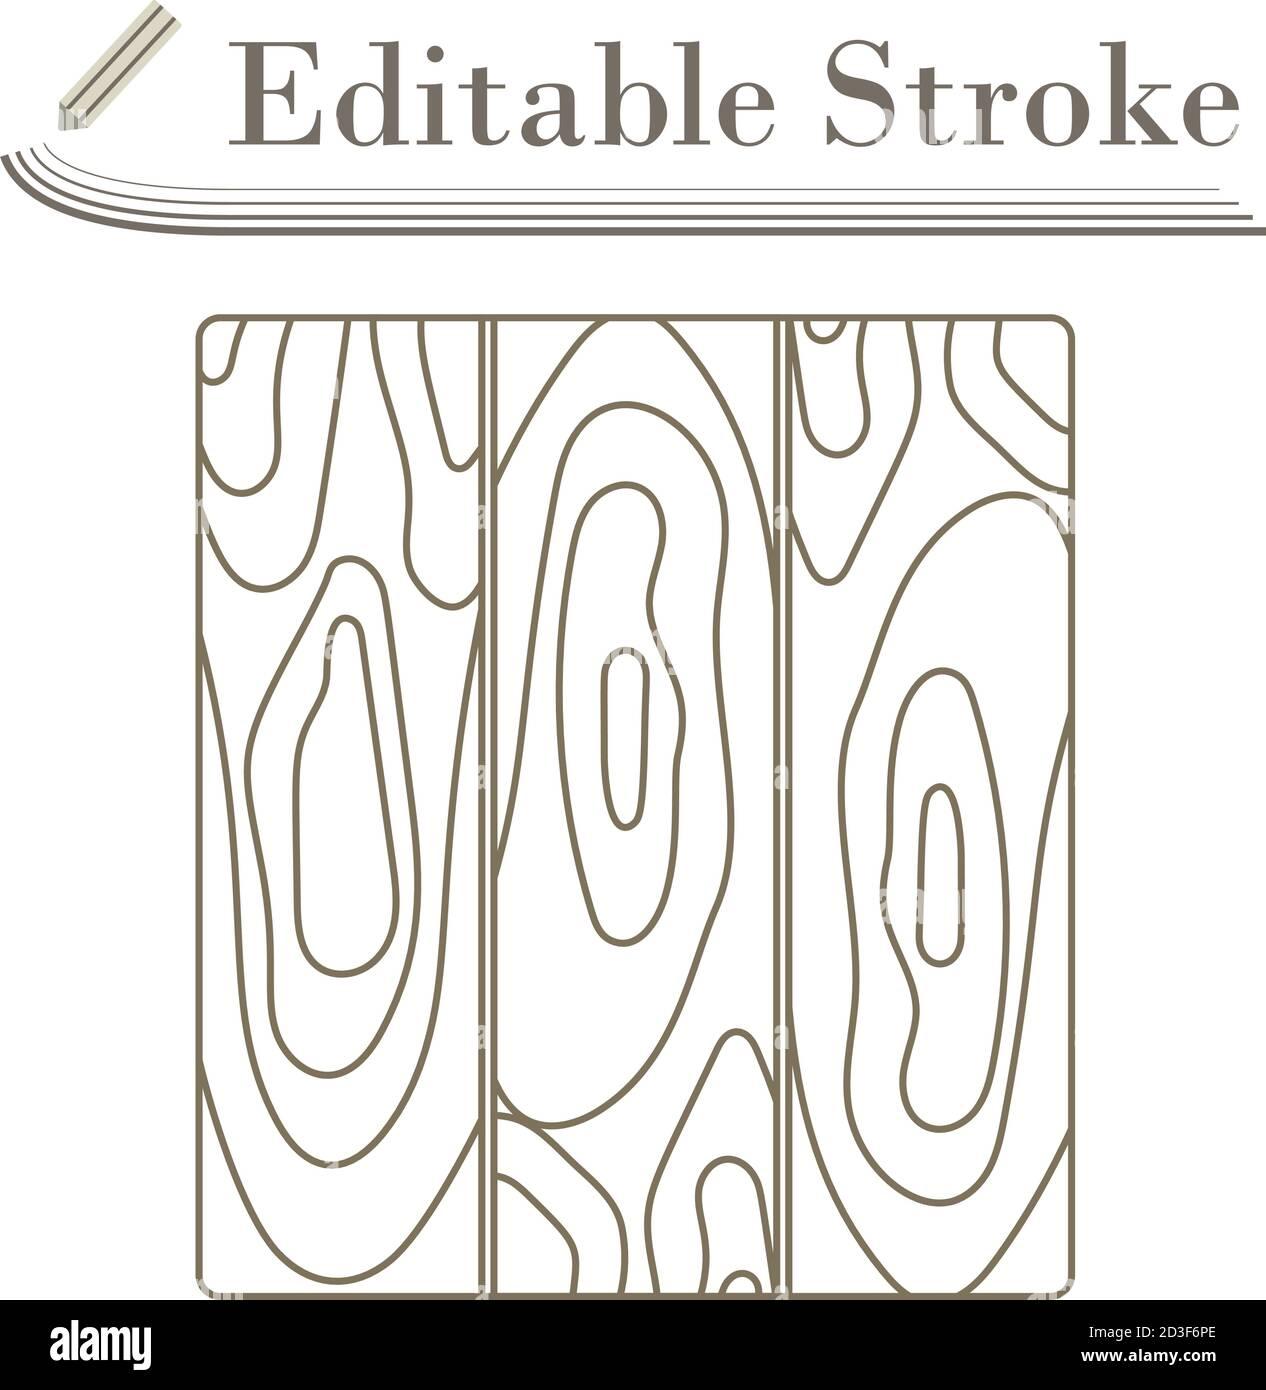 Icon Of Parquet Plank Pattern. Editable Stroke Simple Design. Vector Illustration. Stock Vector